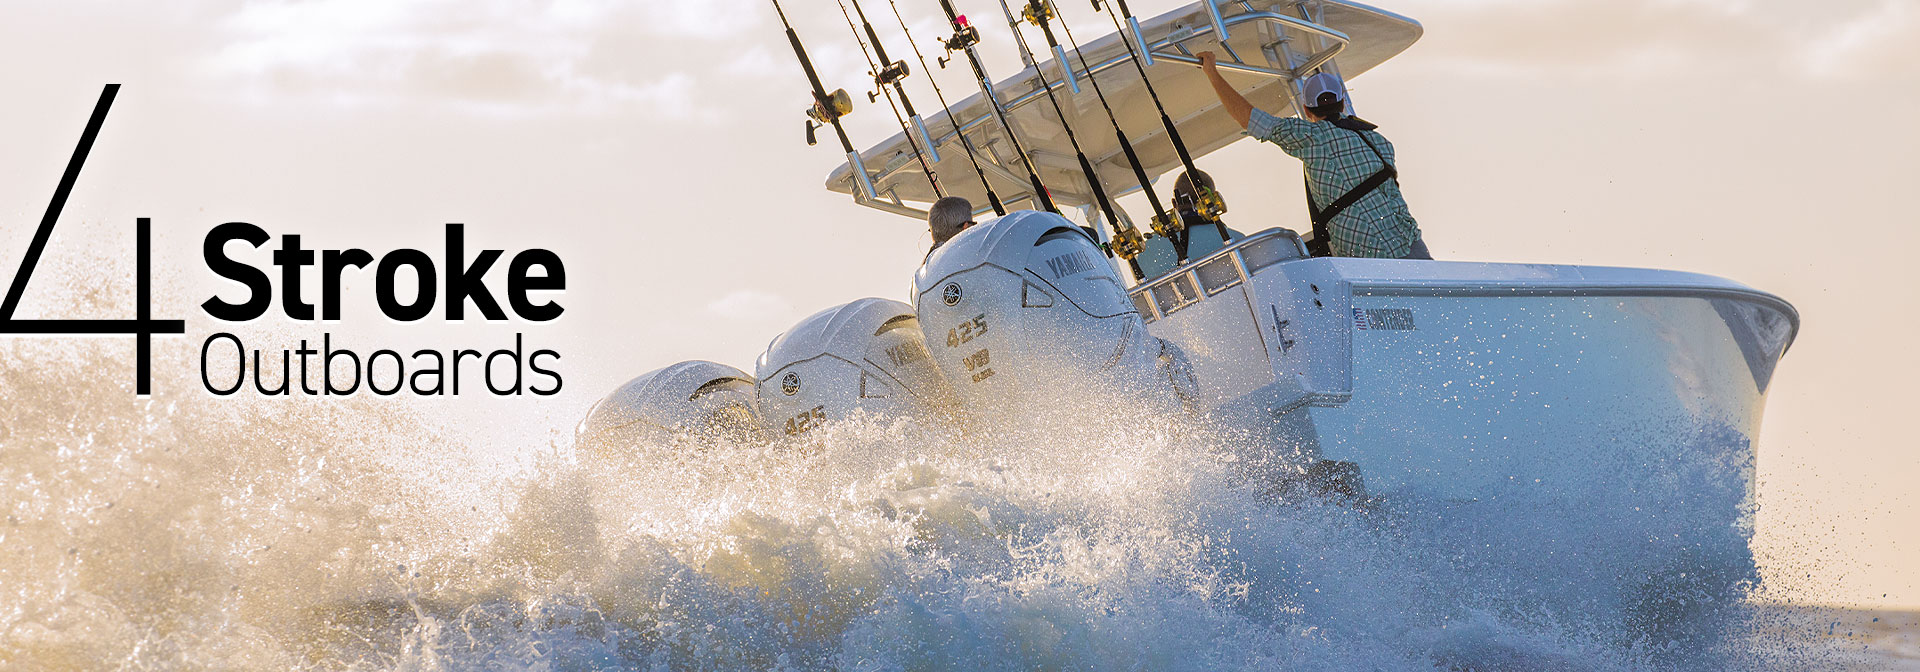 Outboards | Yamaha Motor Co , Ltd